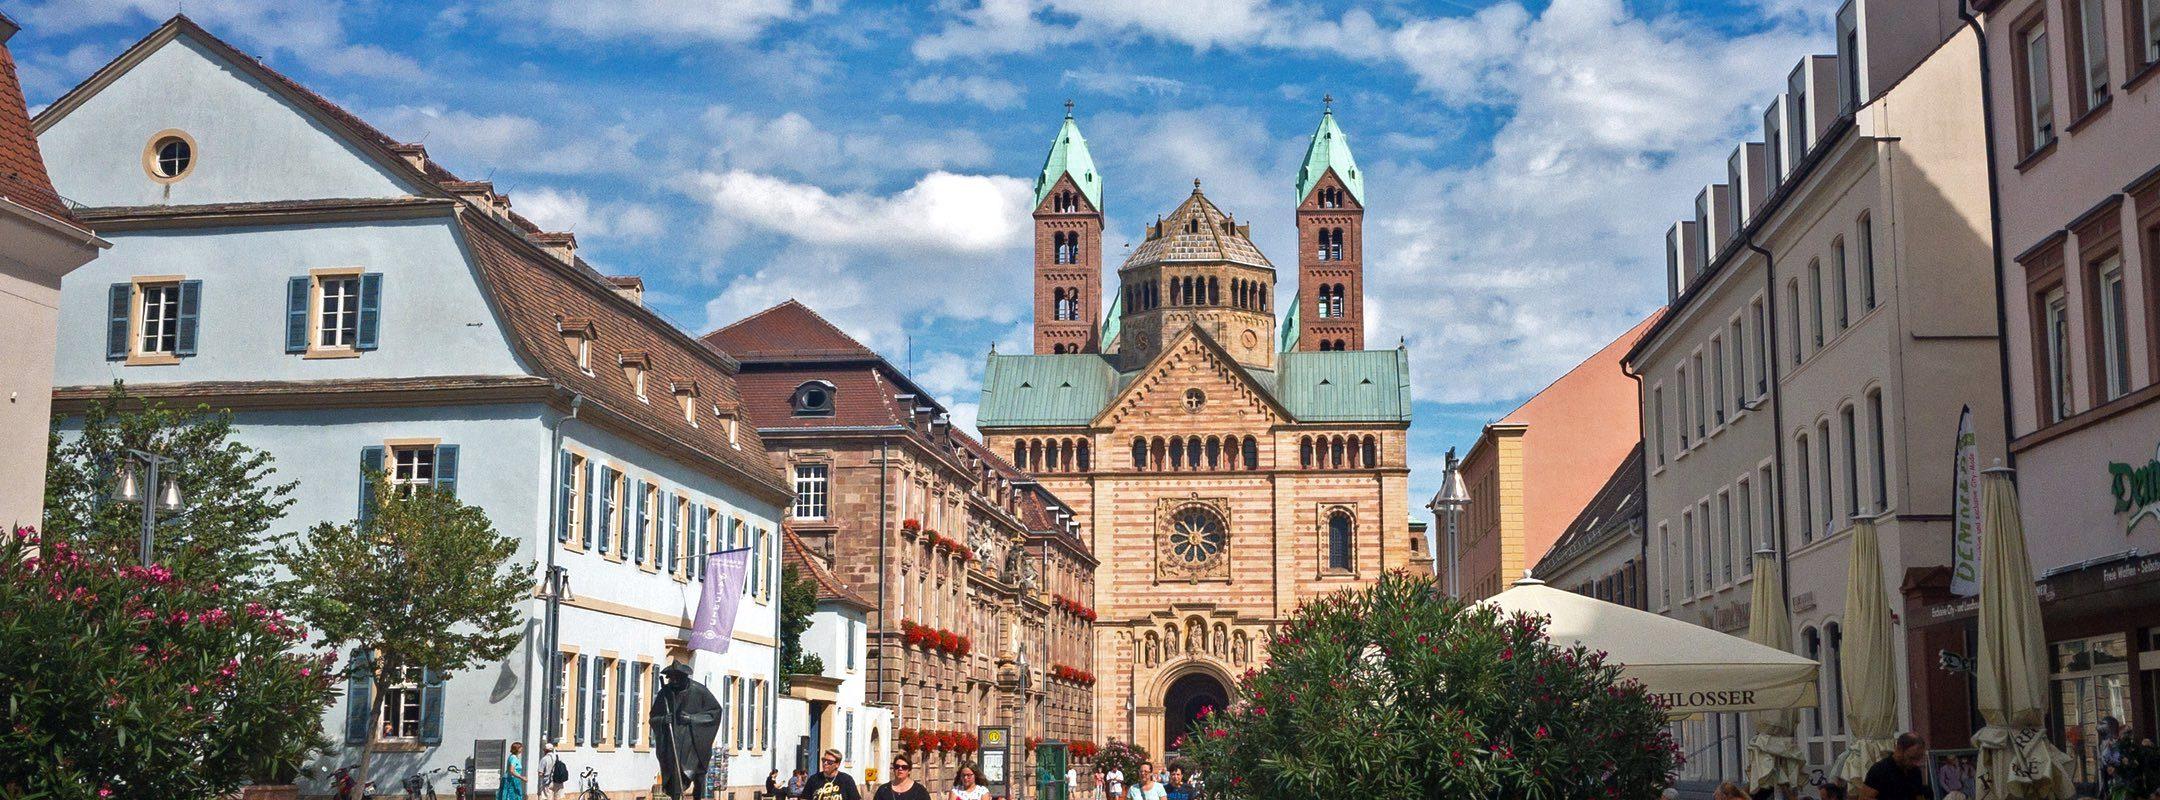 Wahlstation Speyersemester an Speyer Uni - wie funktioniert es?